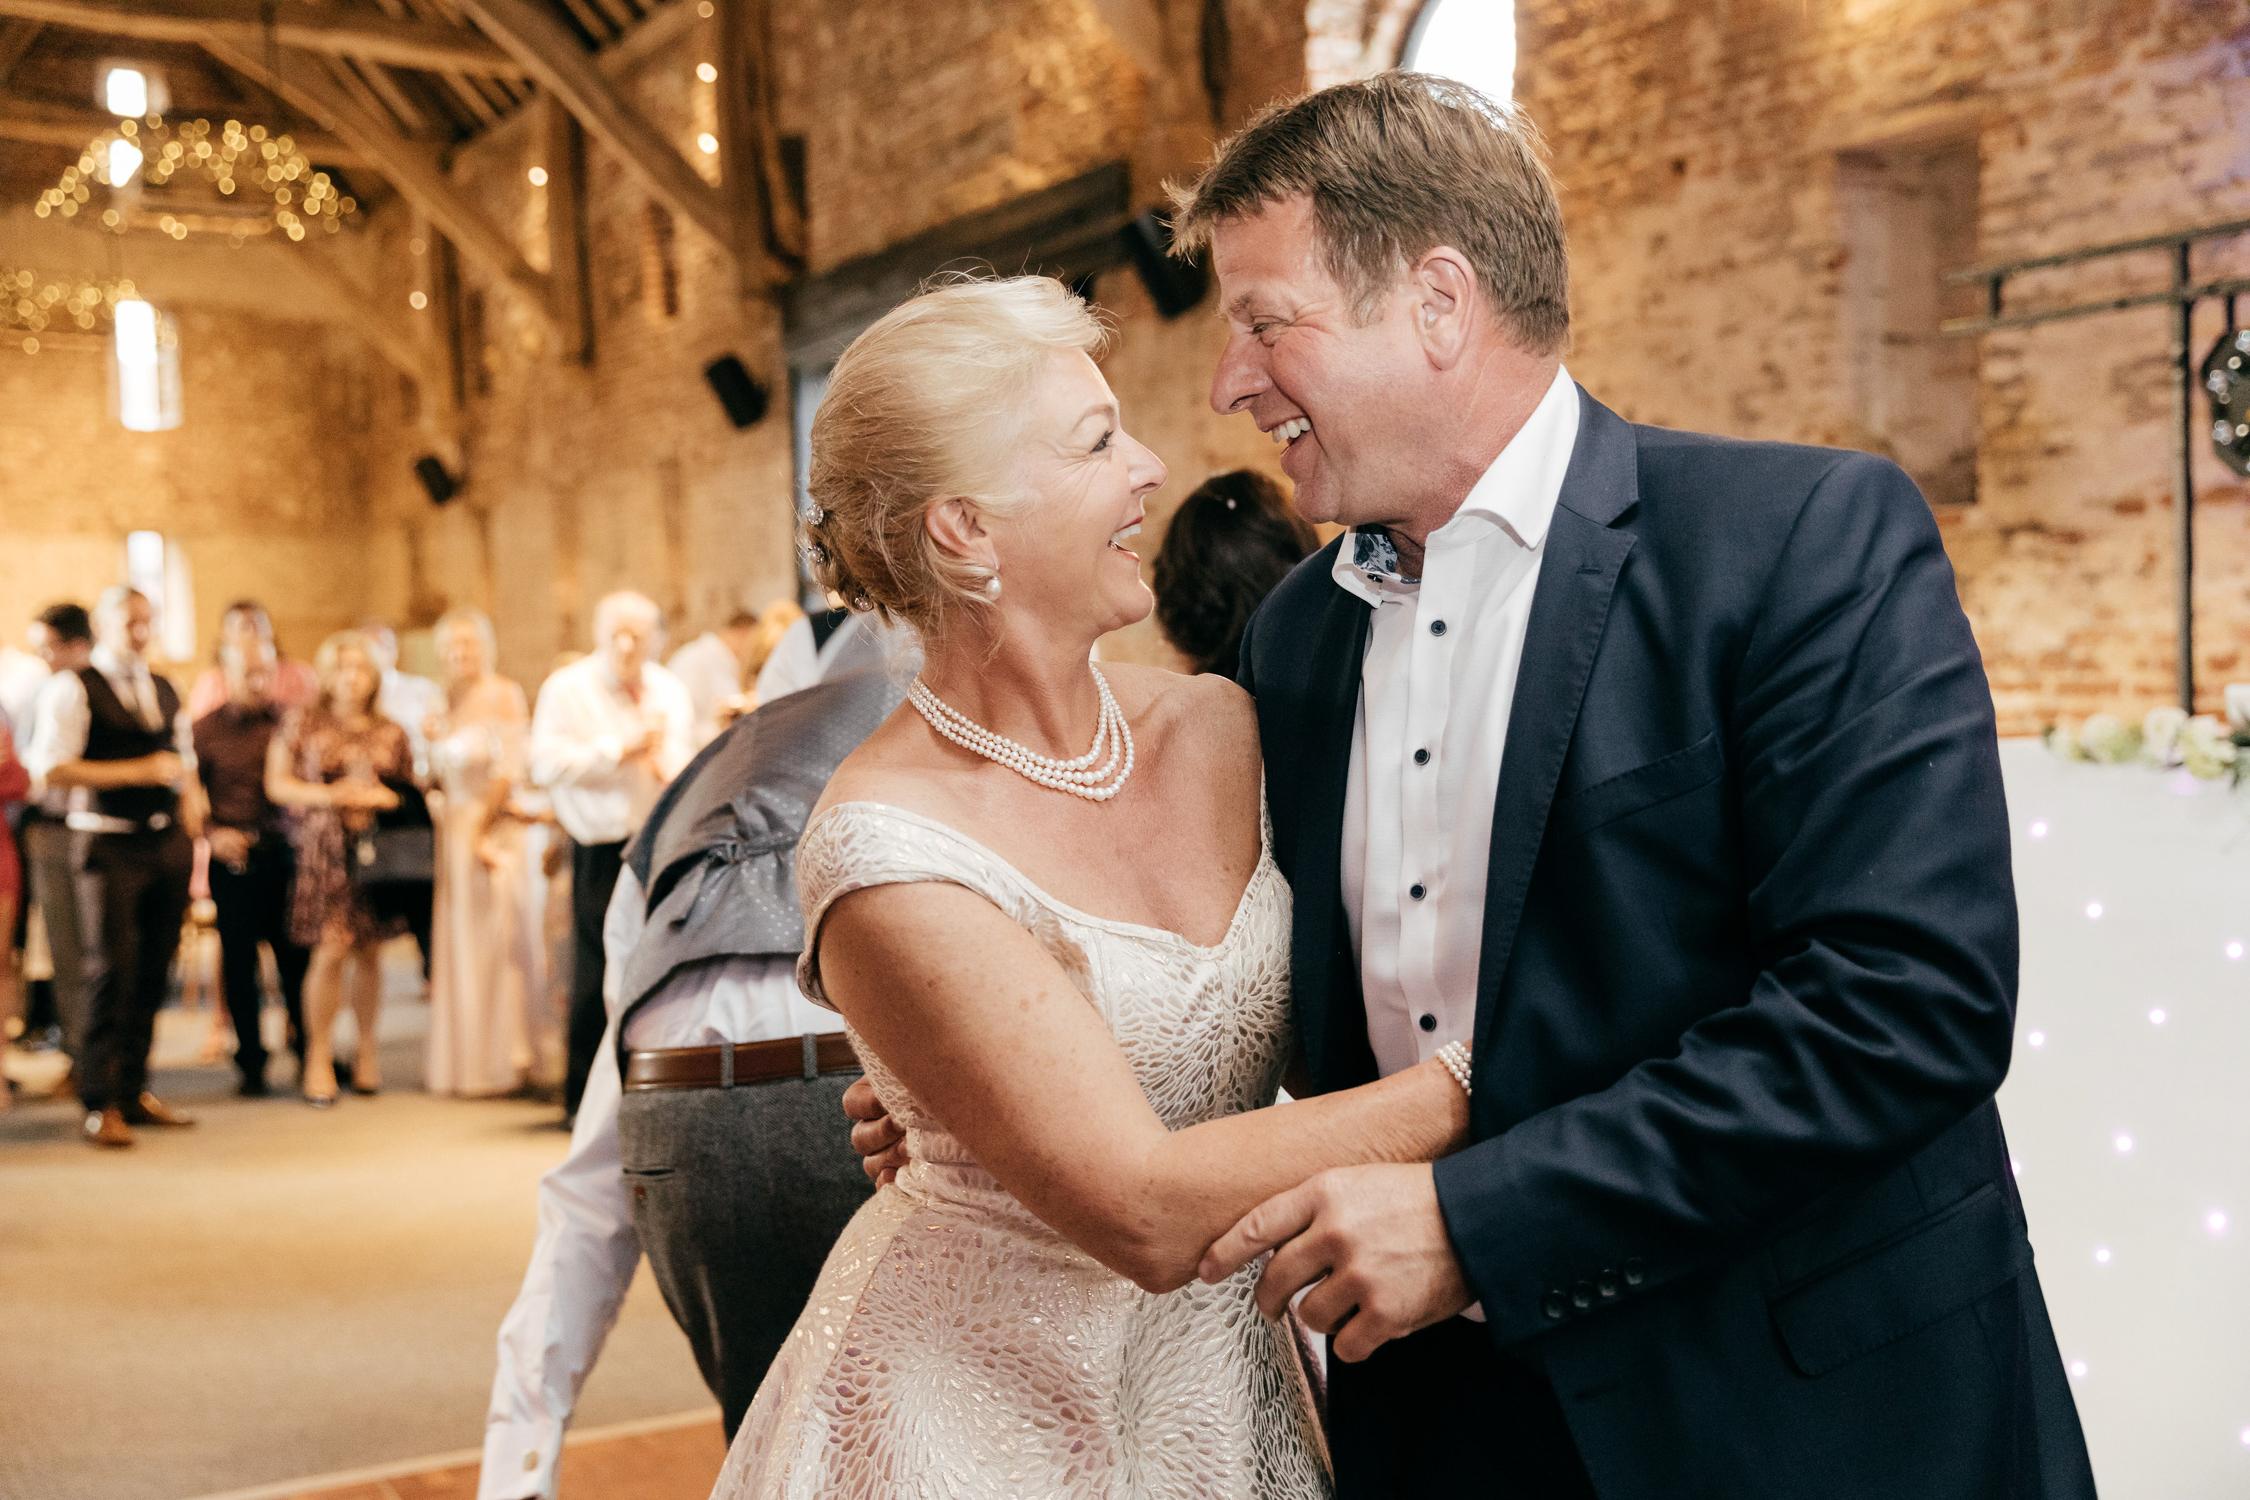 joyful wedding guests dancing